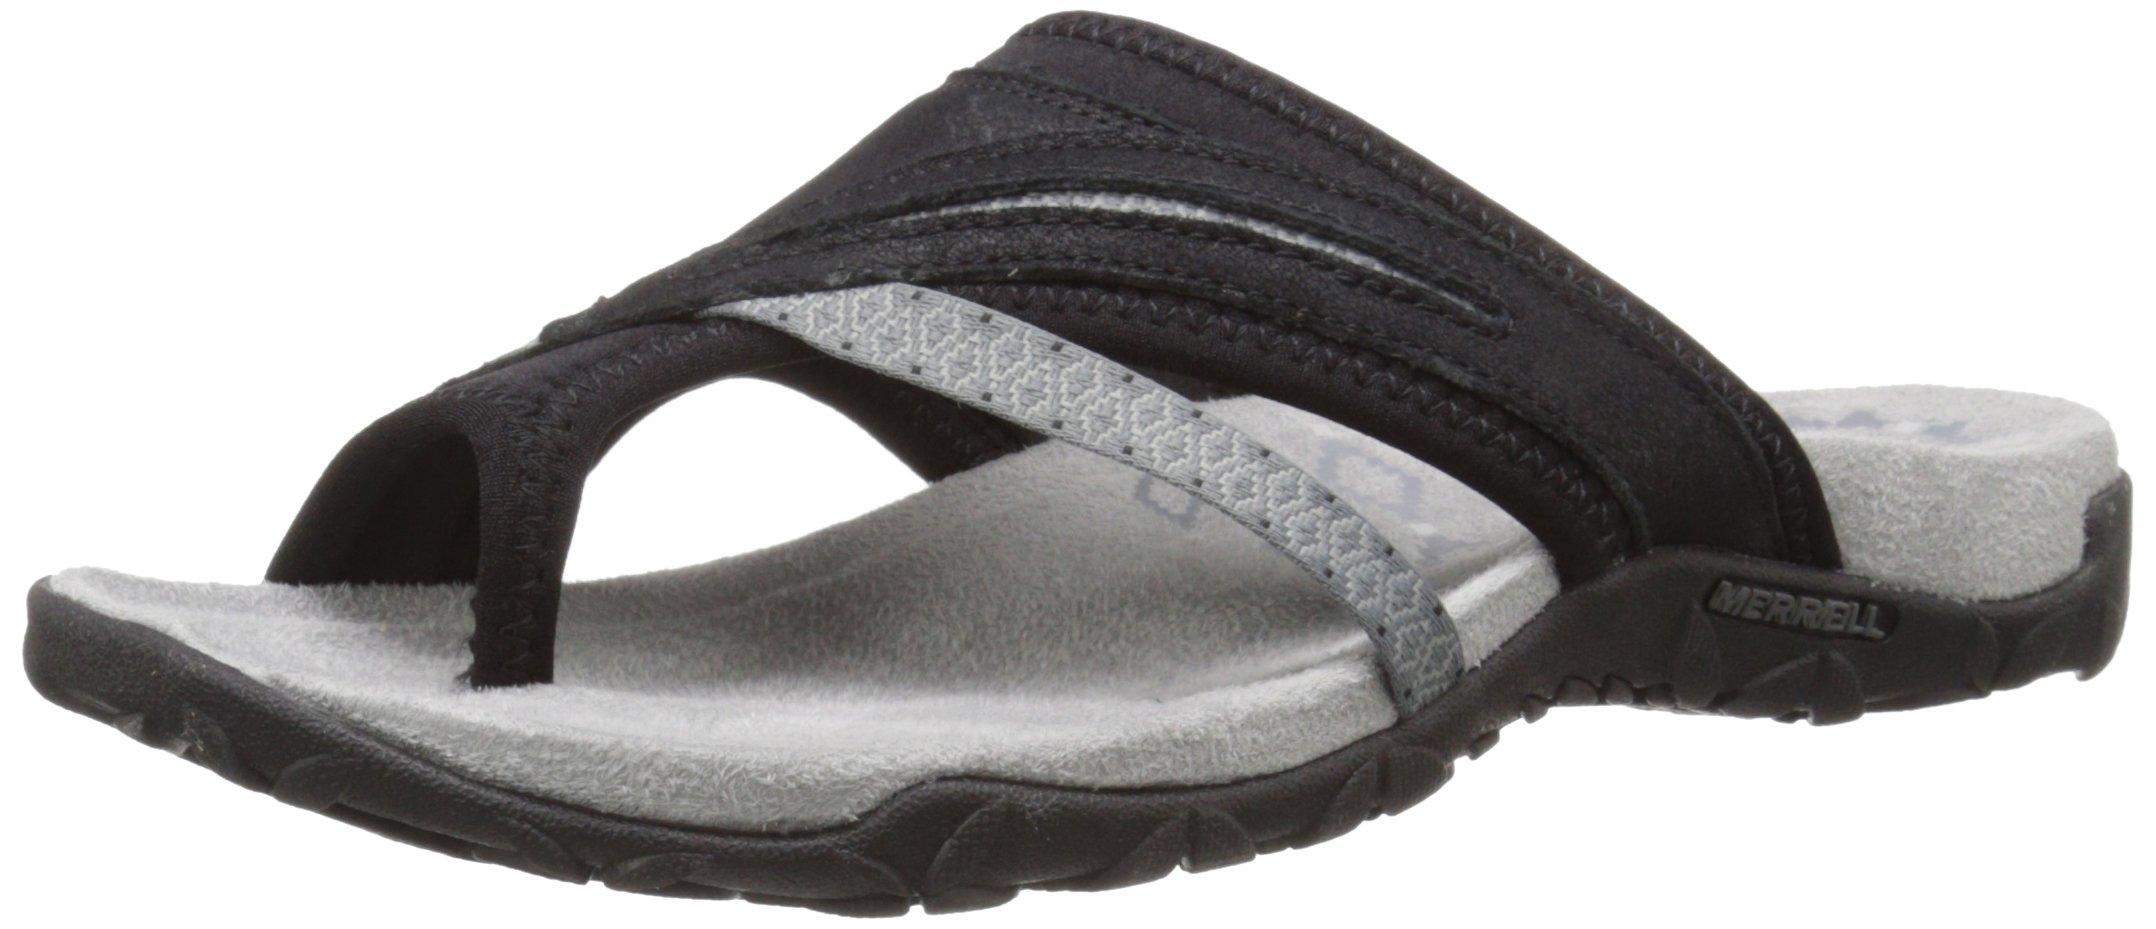 Merrell Women's Terran Post II Sandal, Black, 8 M US by Merrell